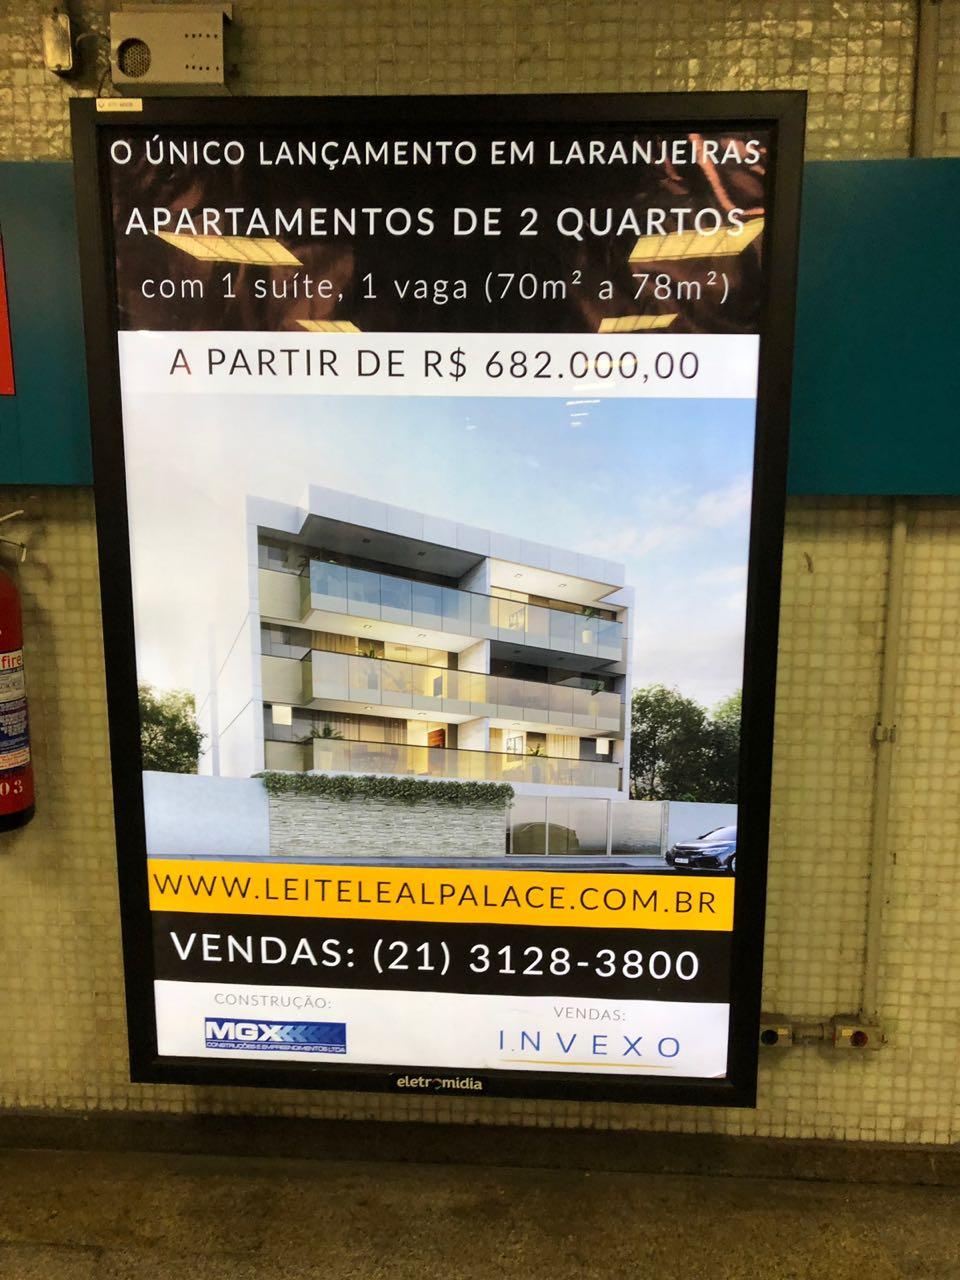 Divulgação - Leite Leal Palace Laranjeiras